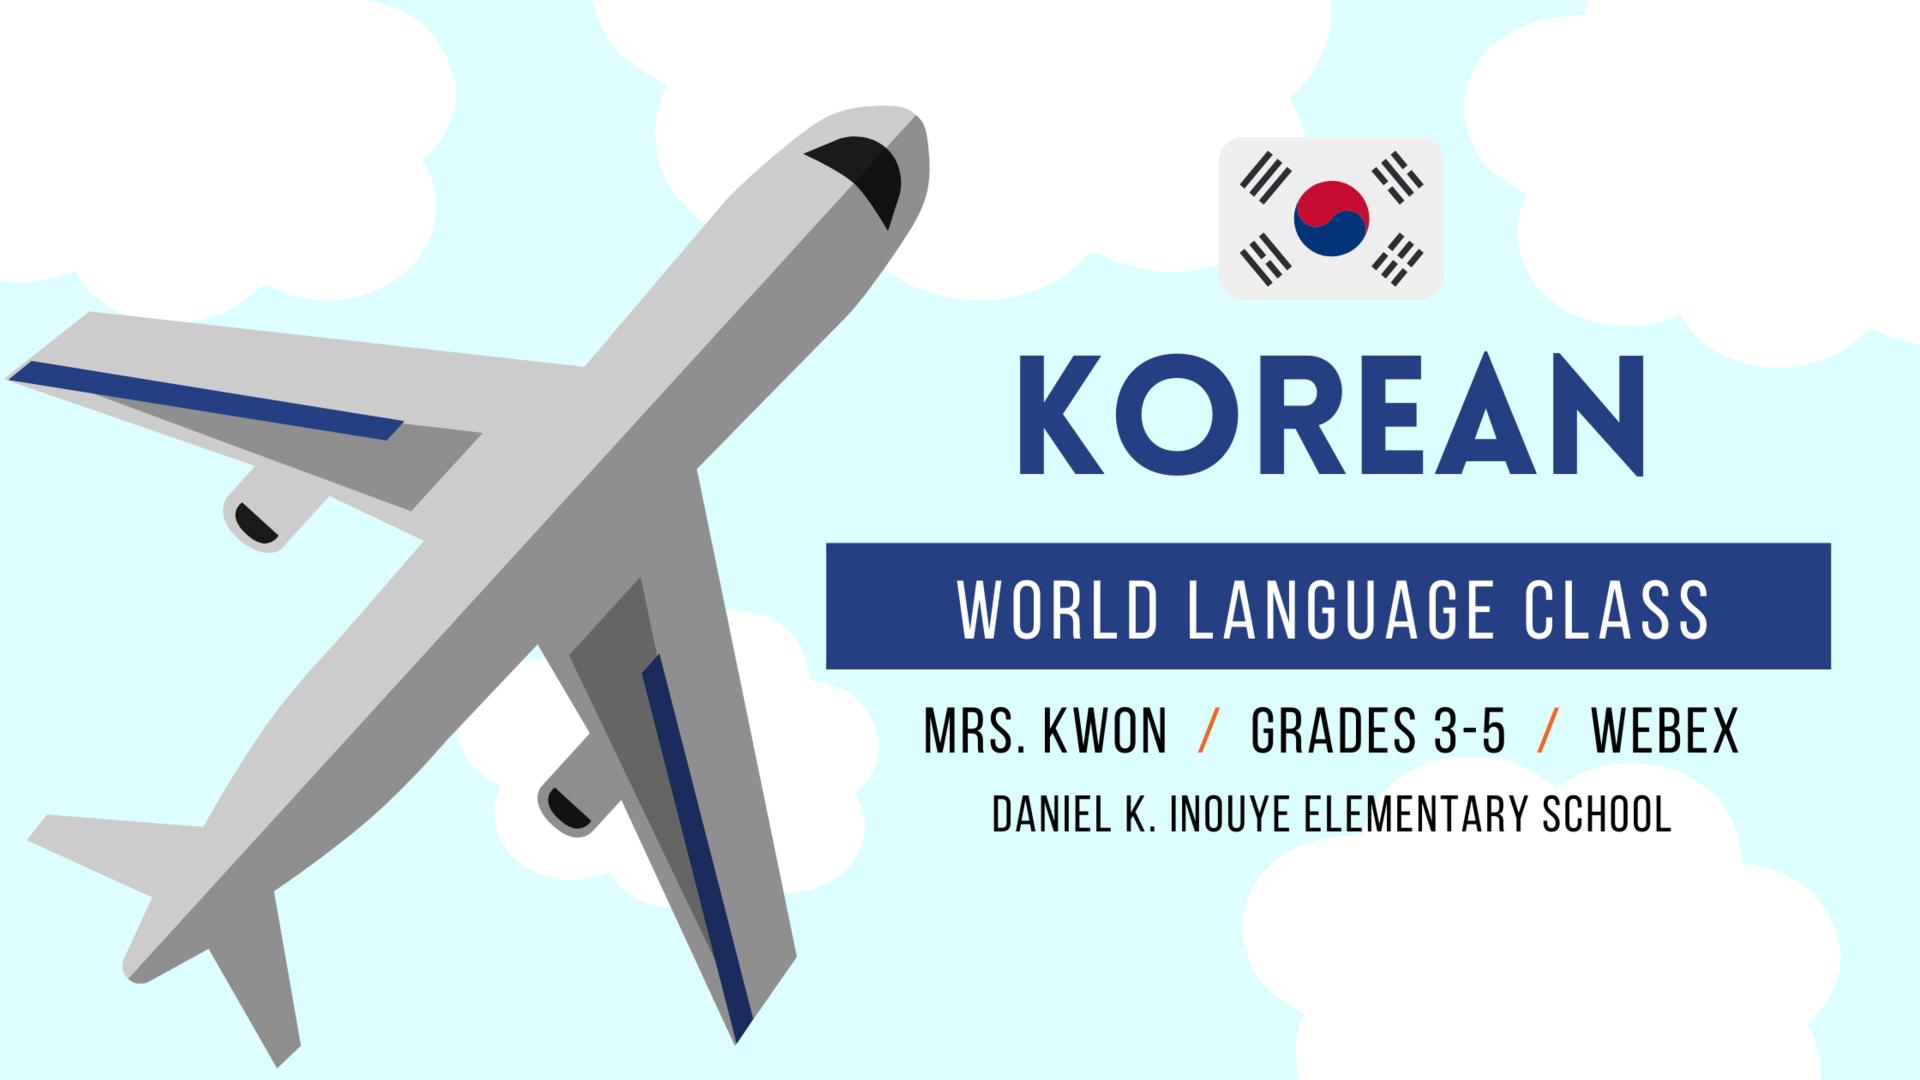 Korean World Language Class